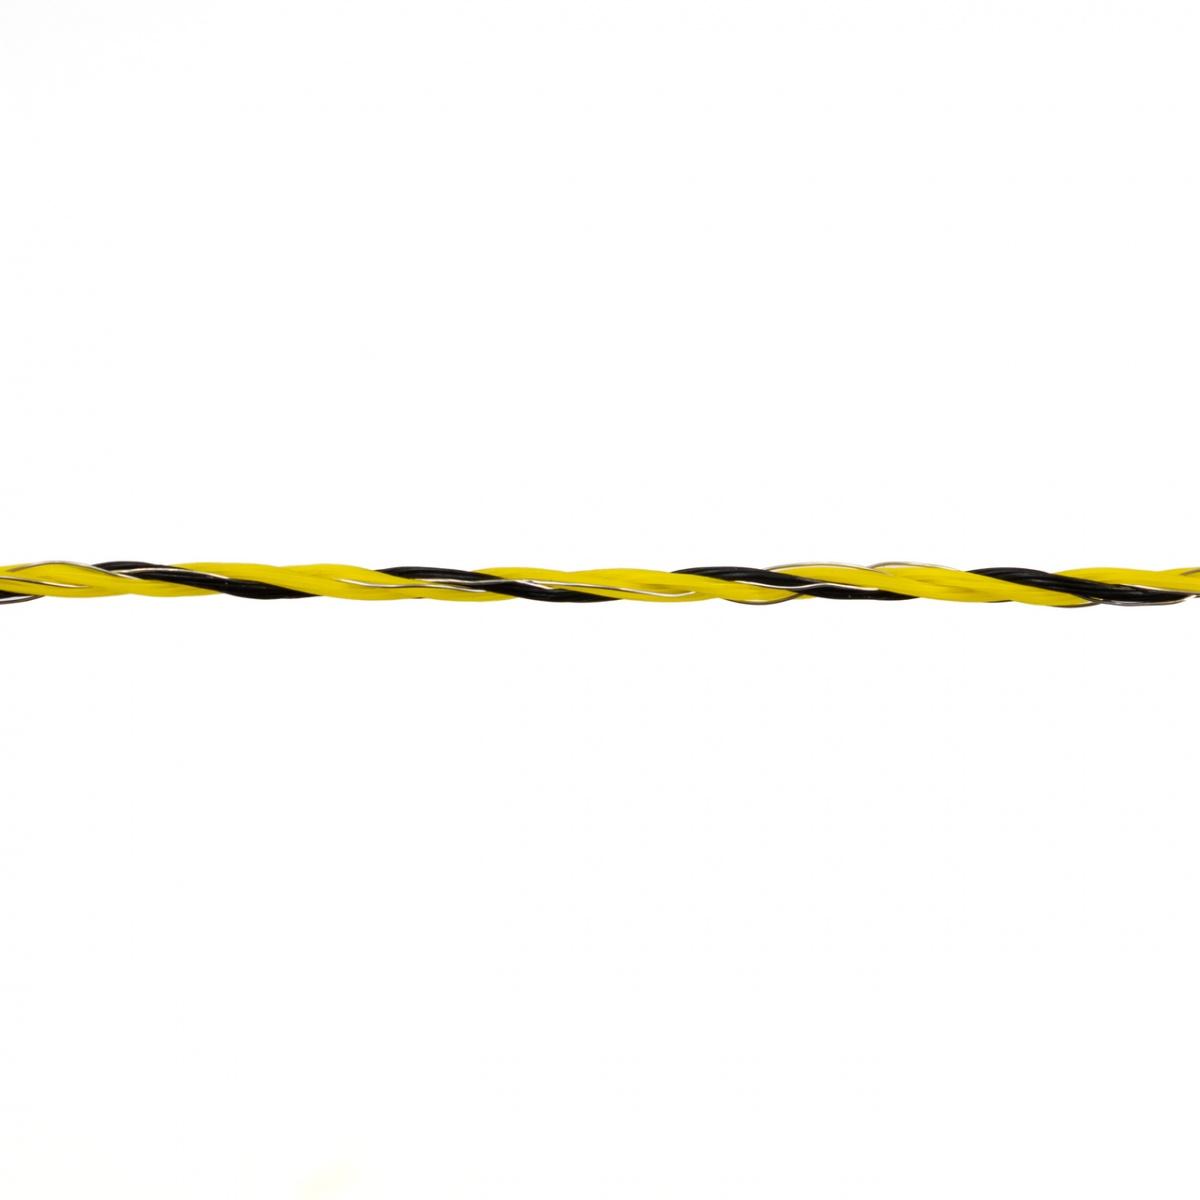 Villanypásztor zsinór - 1000m - 100kg - 0,34Ω/m